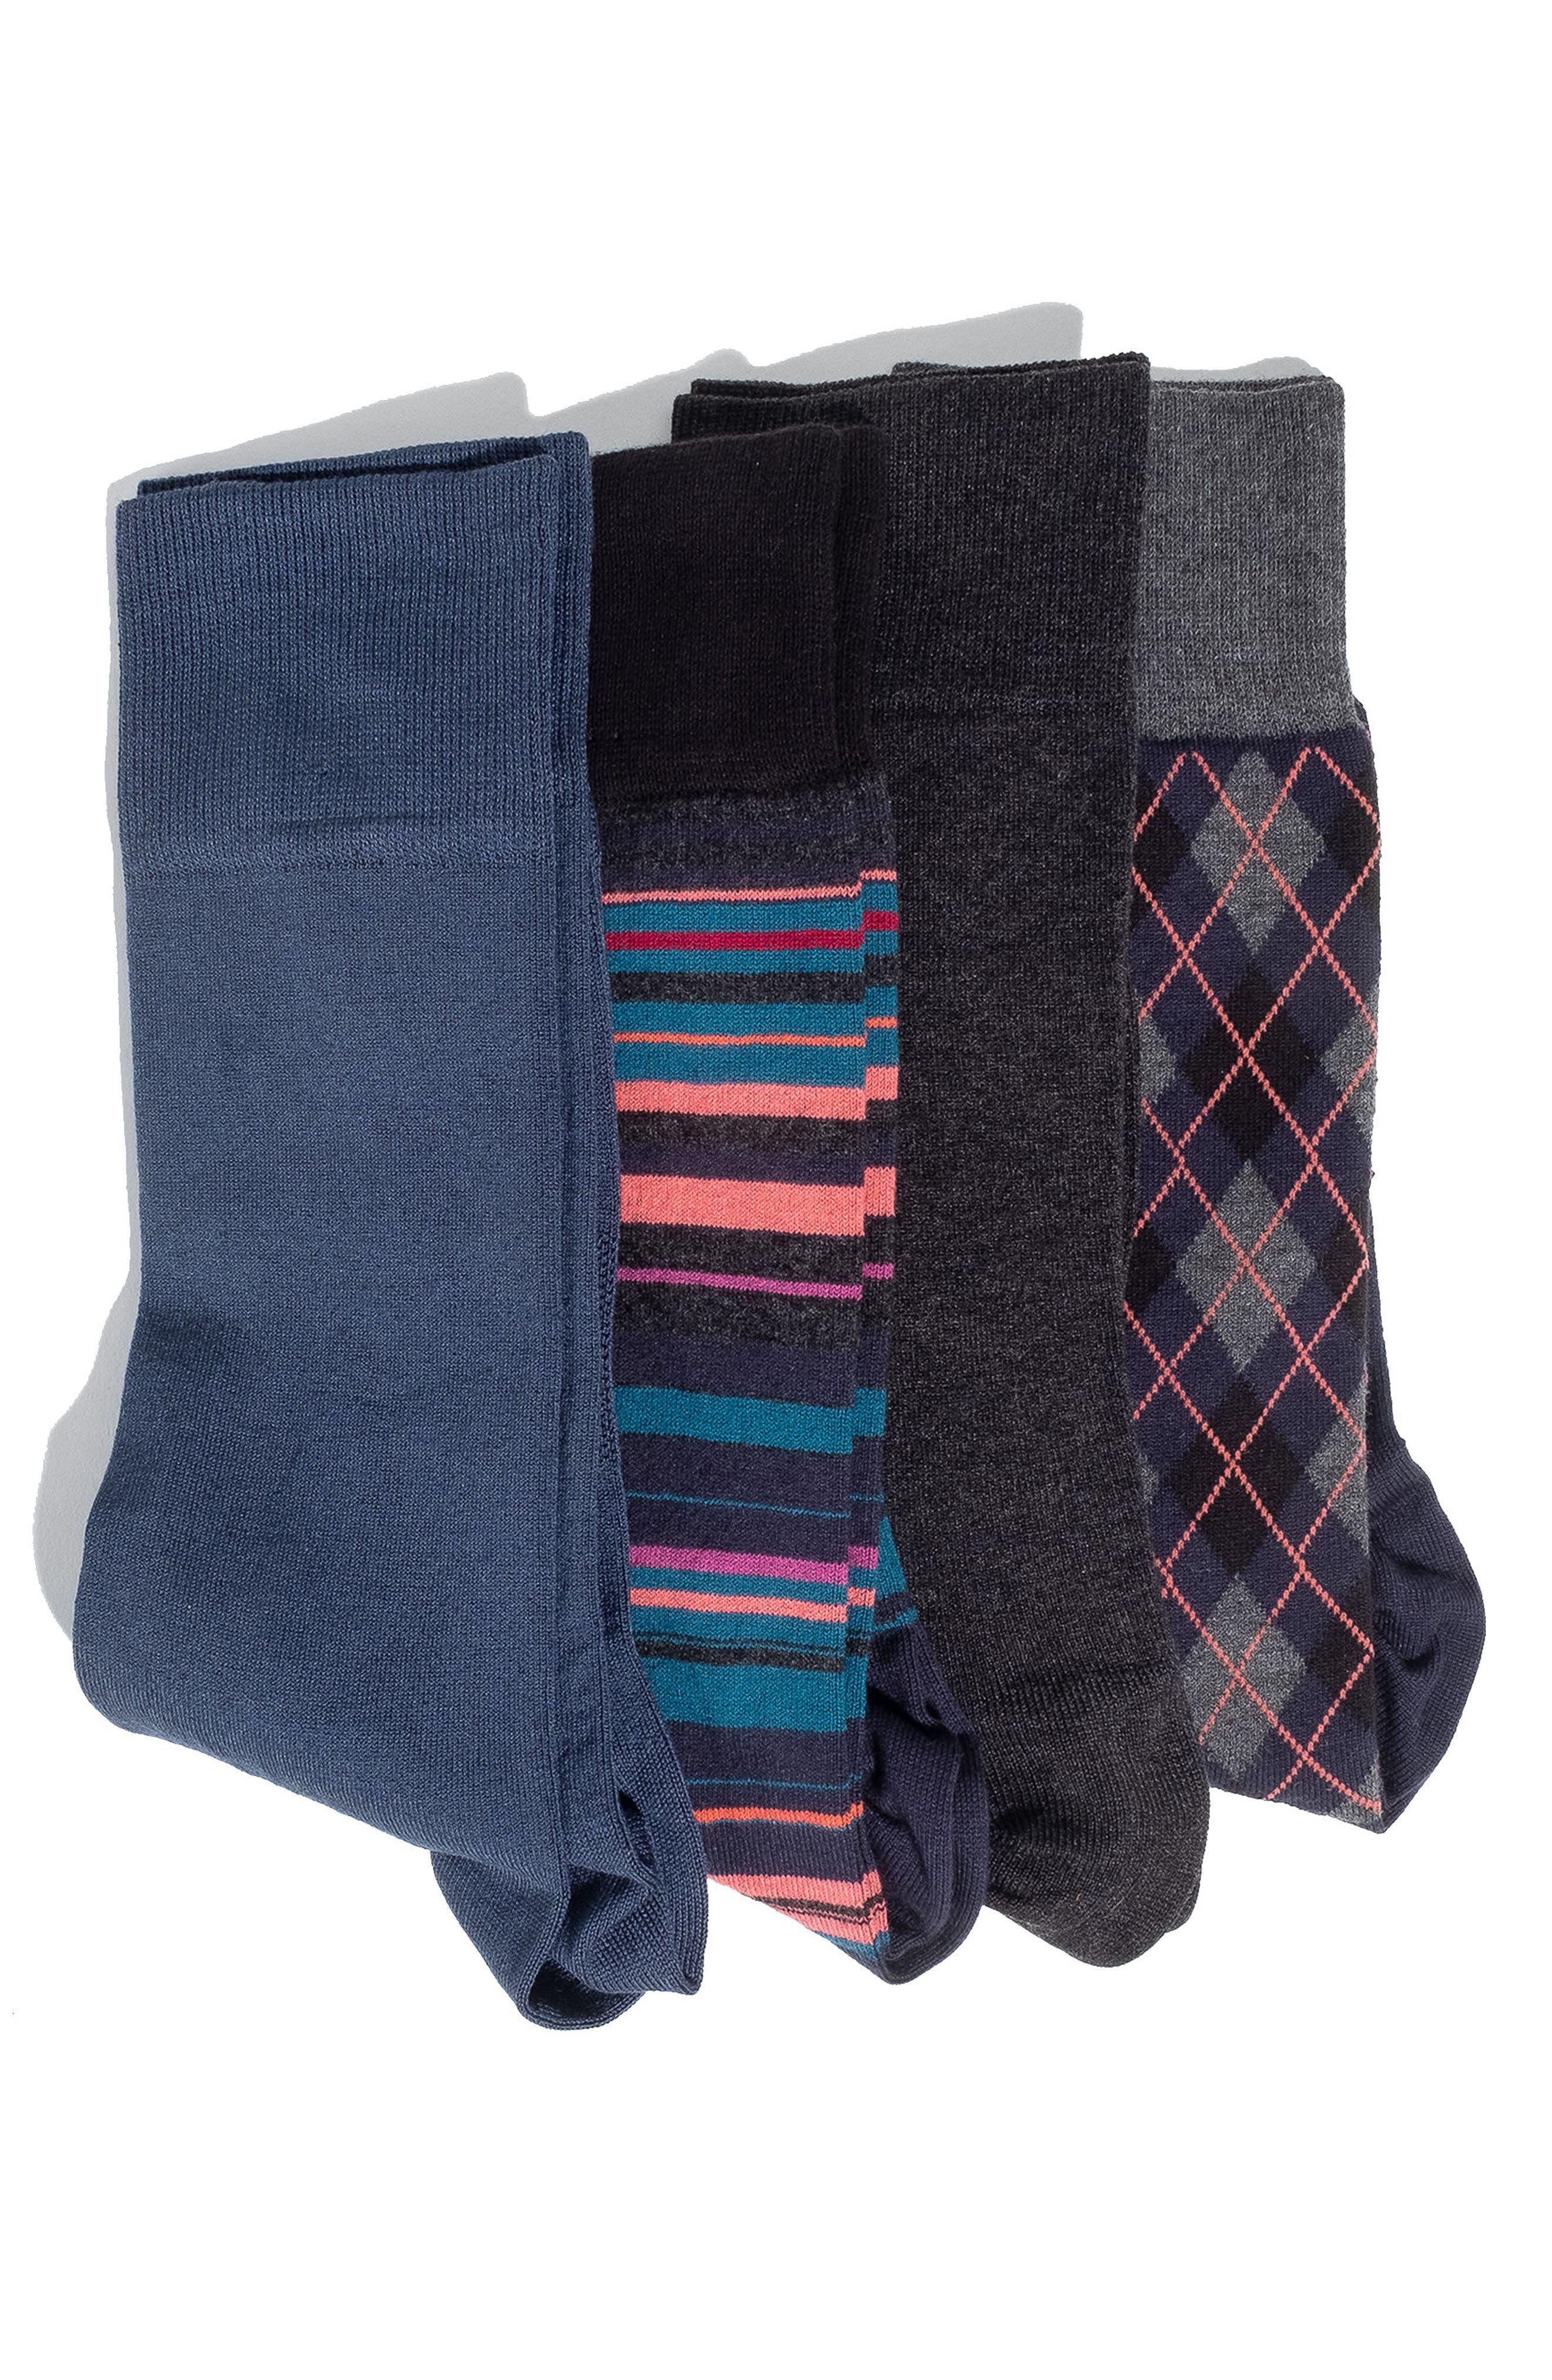 4-Pack Socks,                             Main thumbnail 1, color,